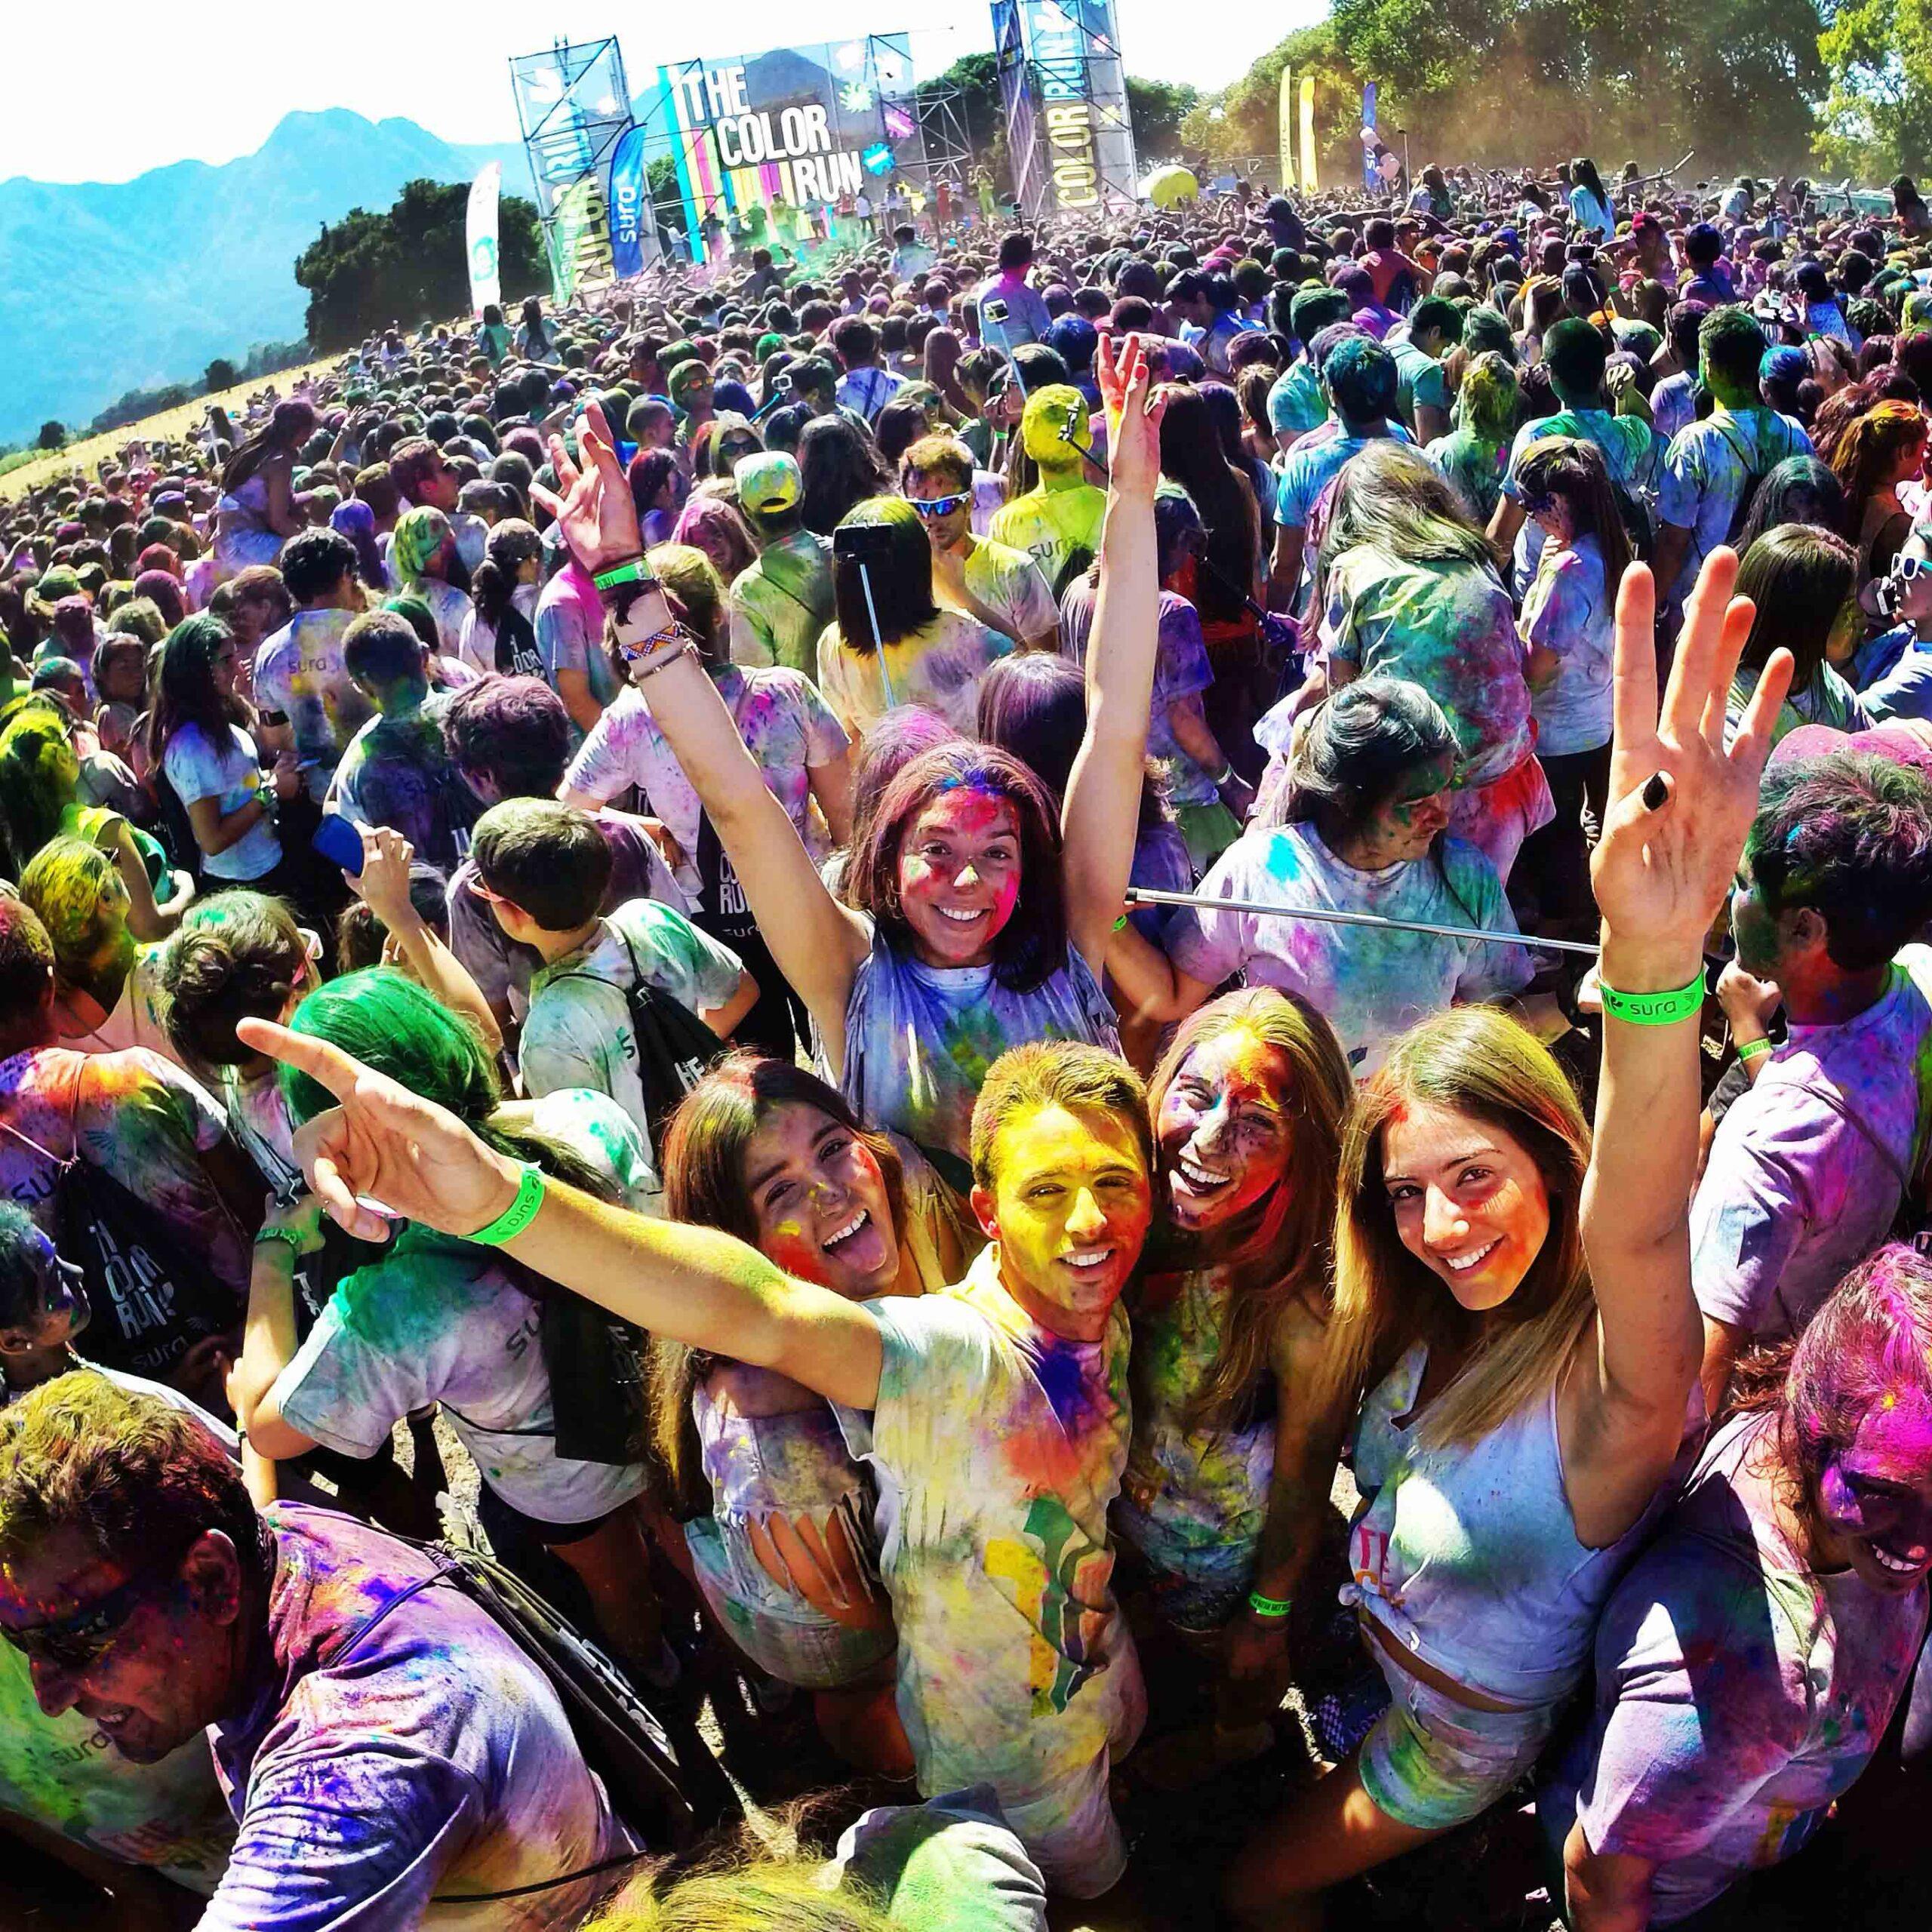 Colorrun Chili pucon crowd selfie